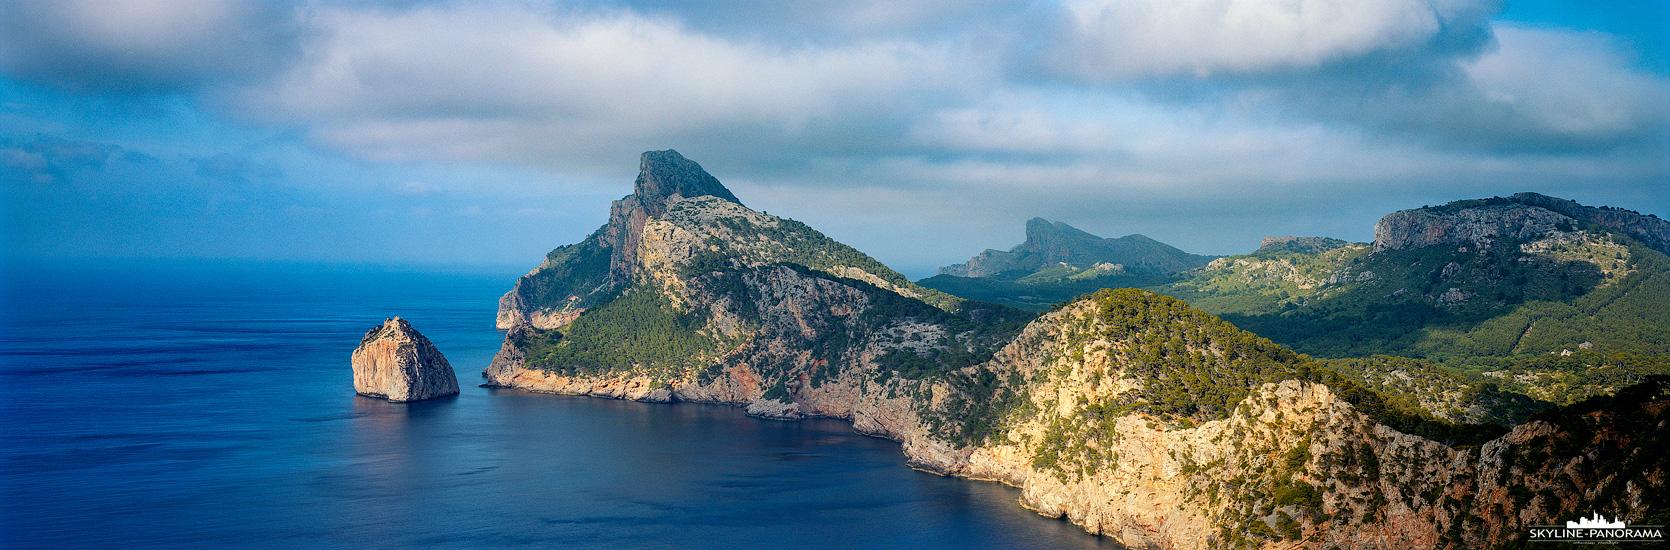 Sehenswürdigkeiten Mallorca - Cap de Formentor (p_01186)